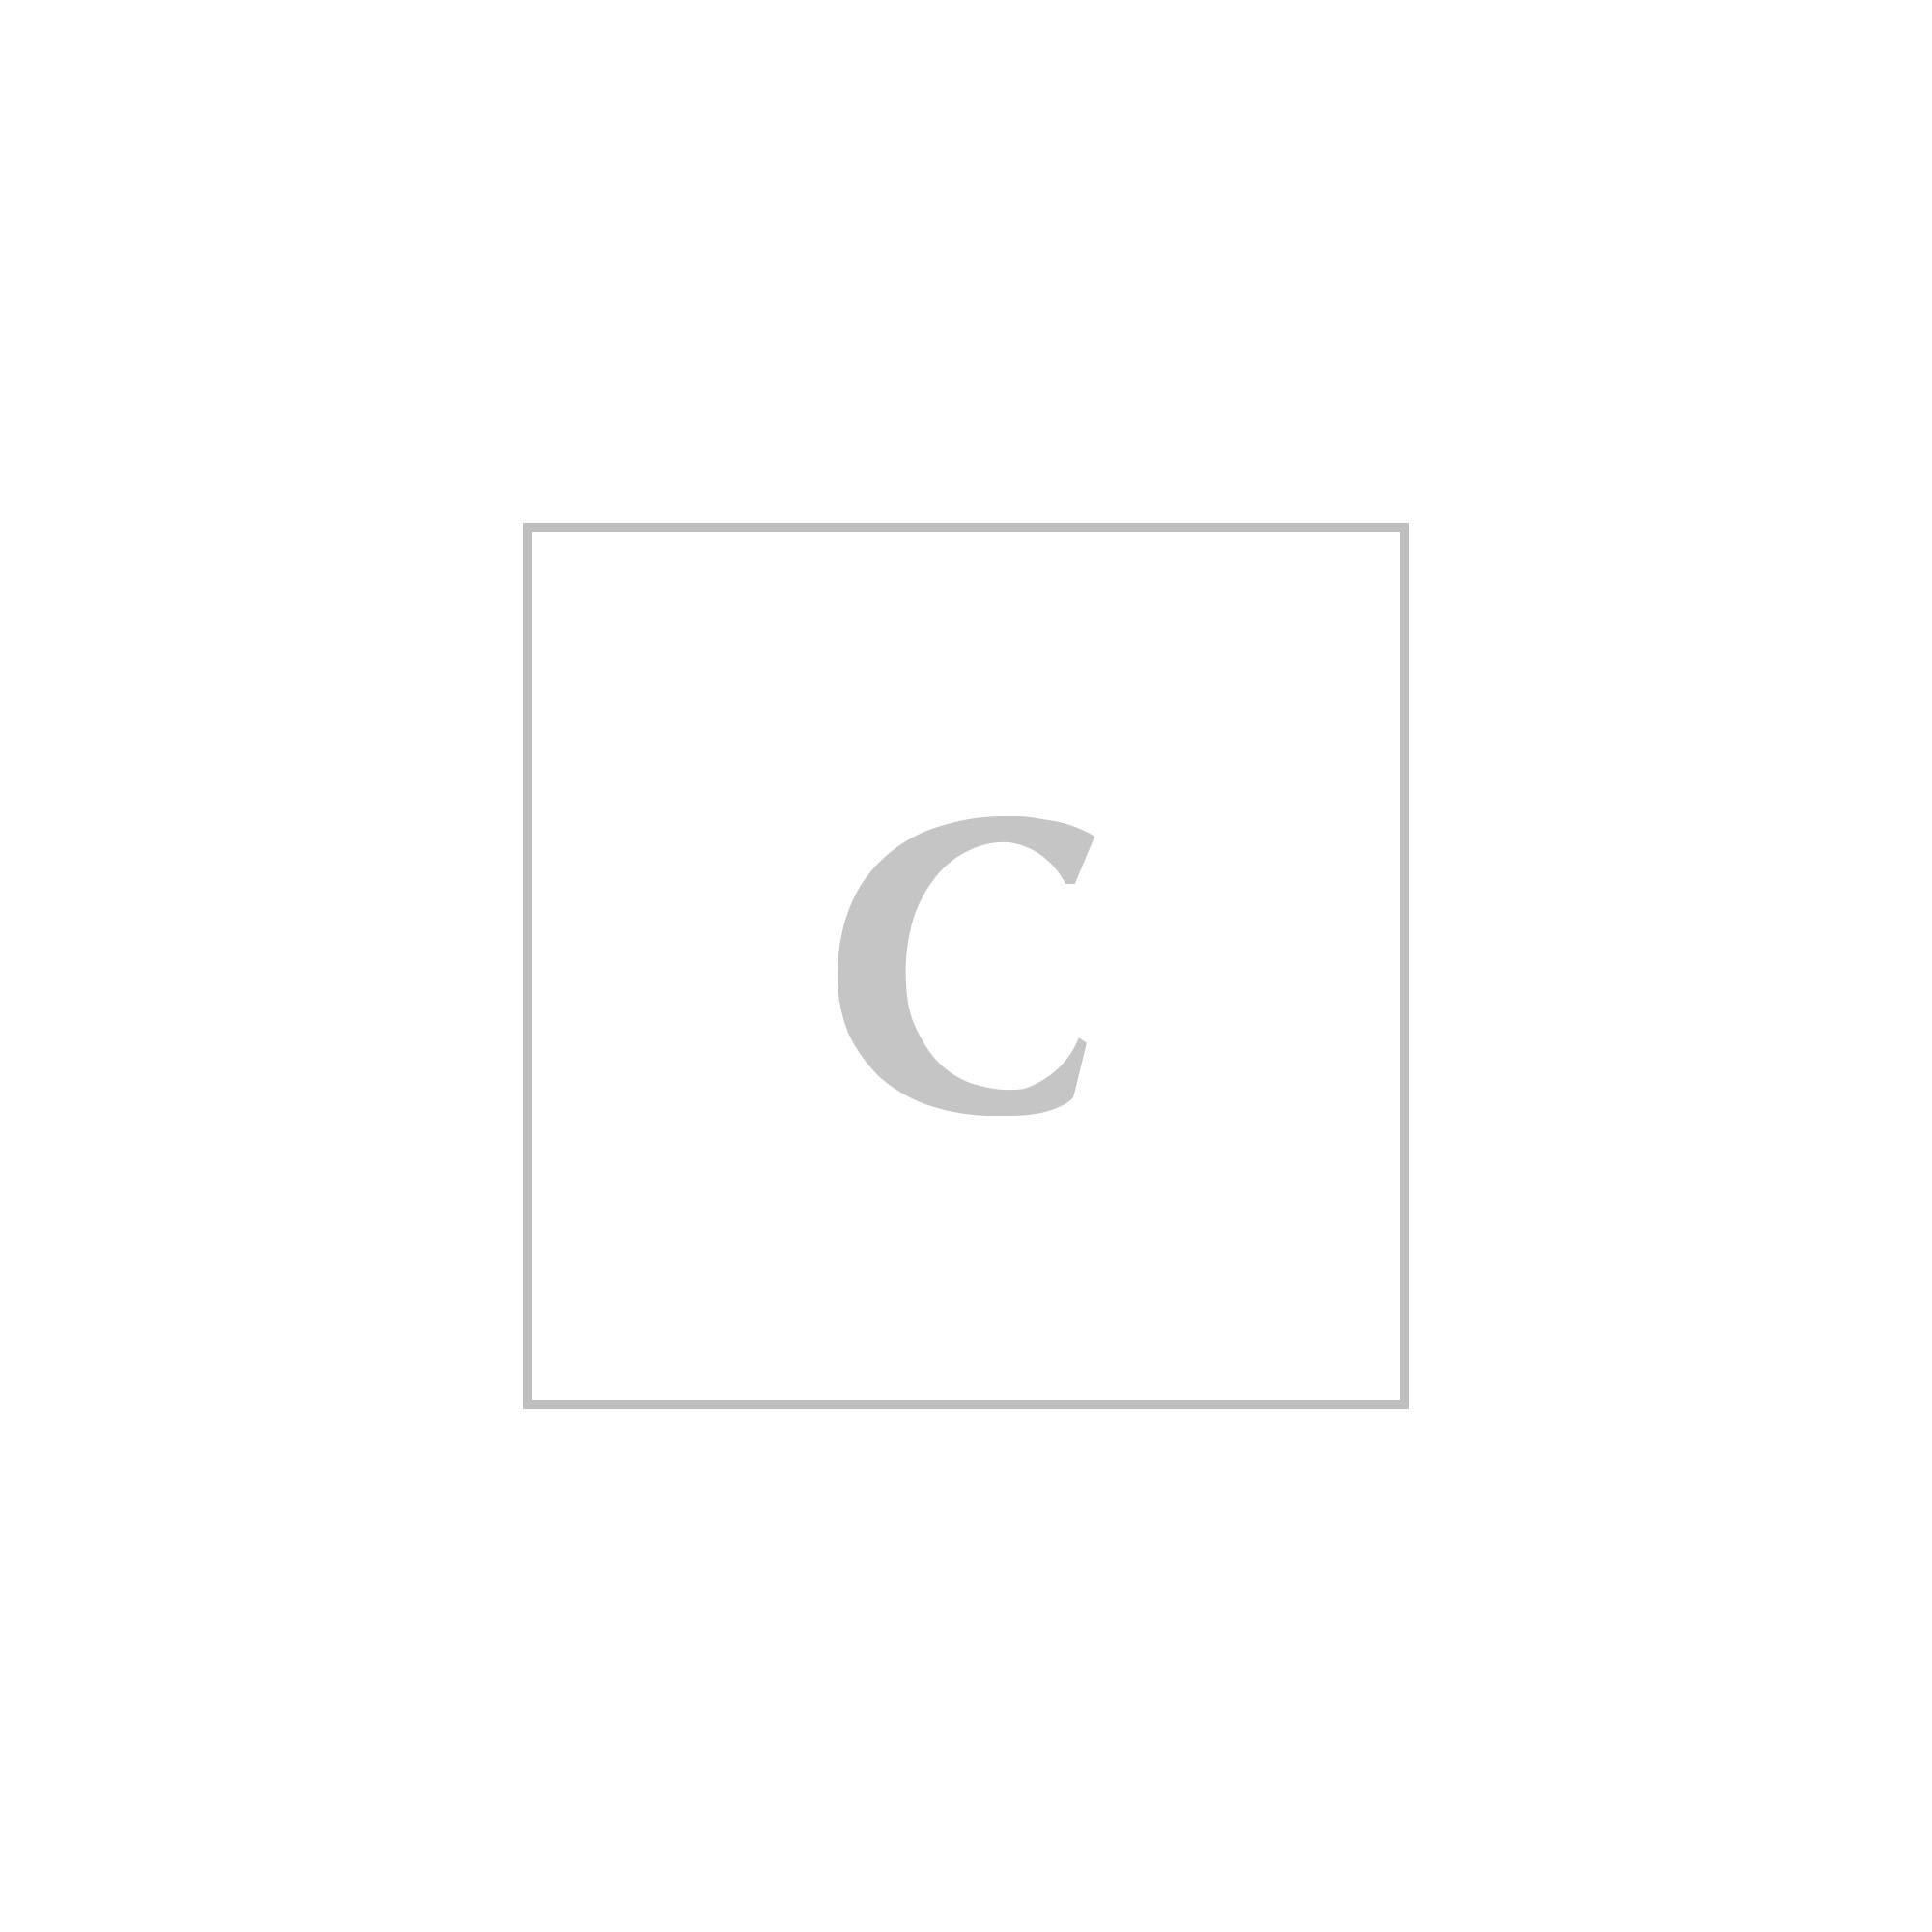 dolce & gabbana accessori donna pouch portacarte dg millennials